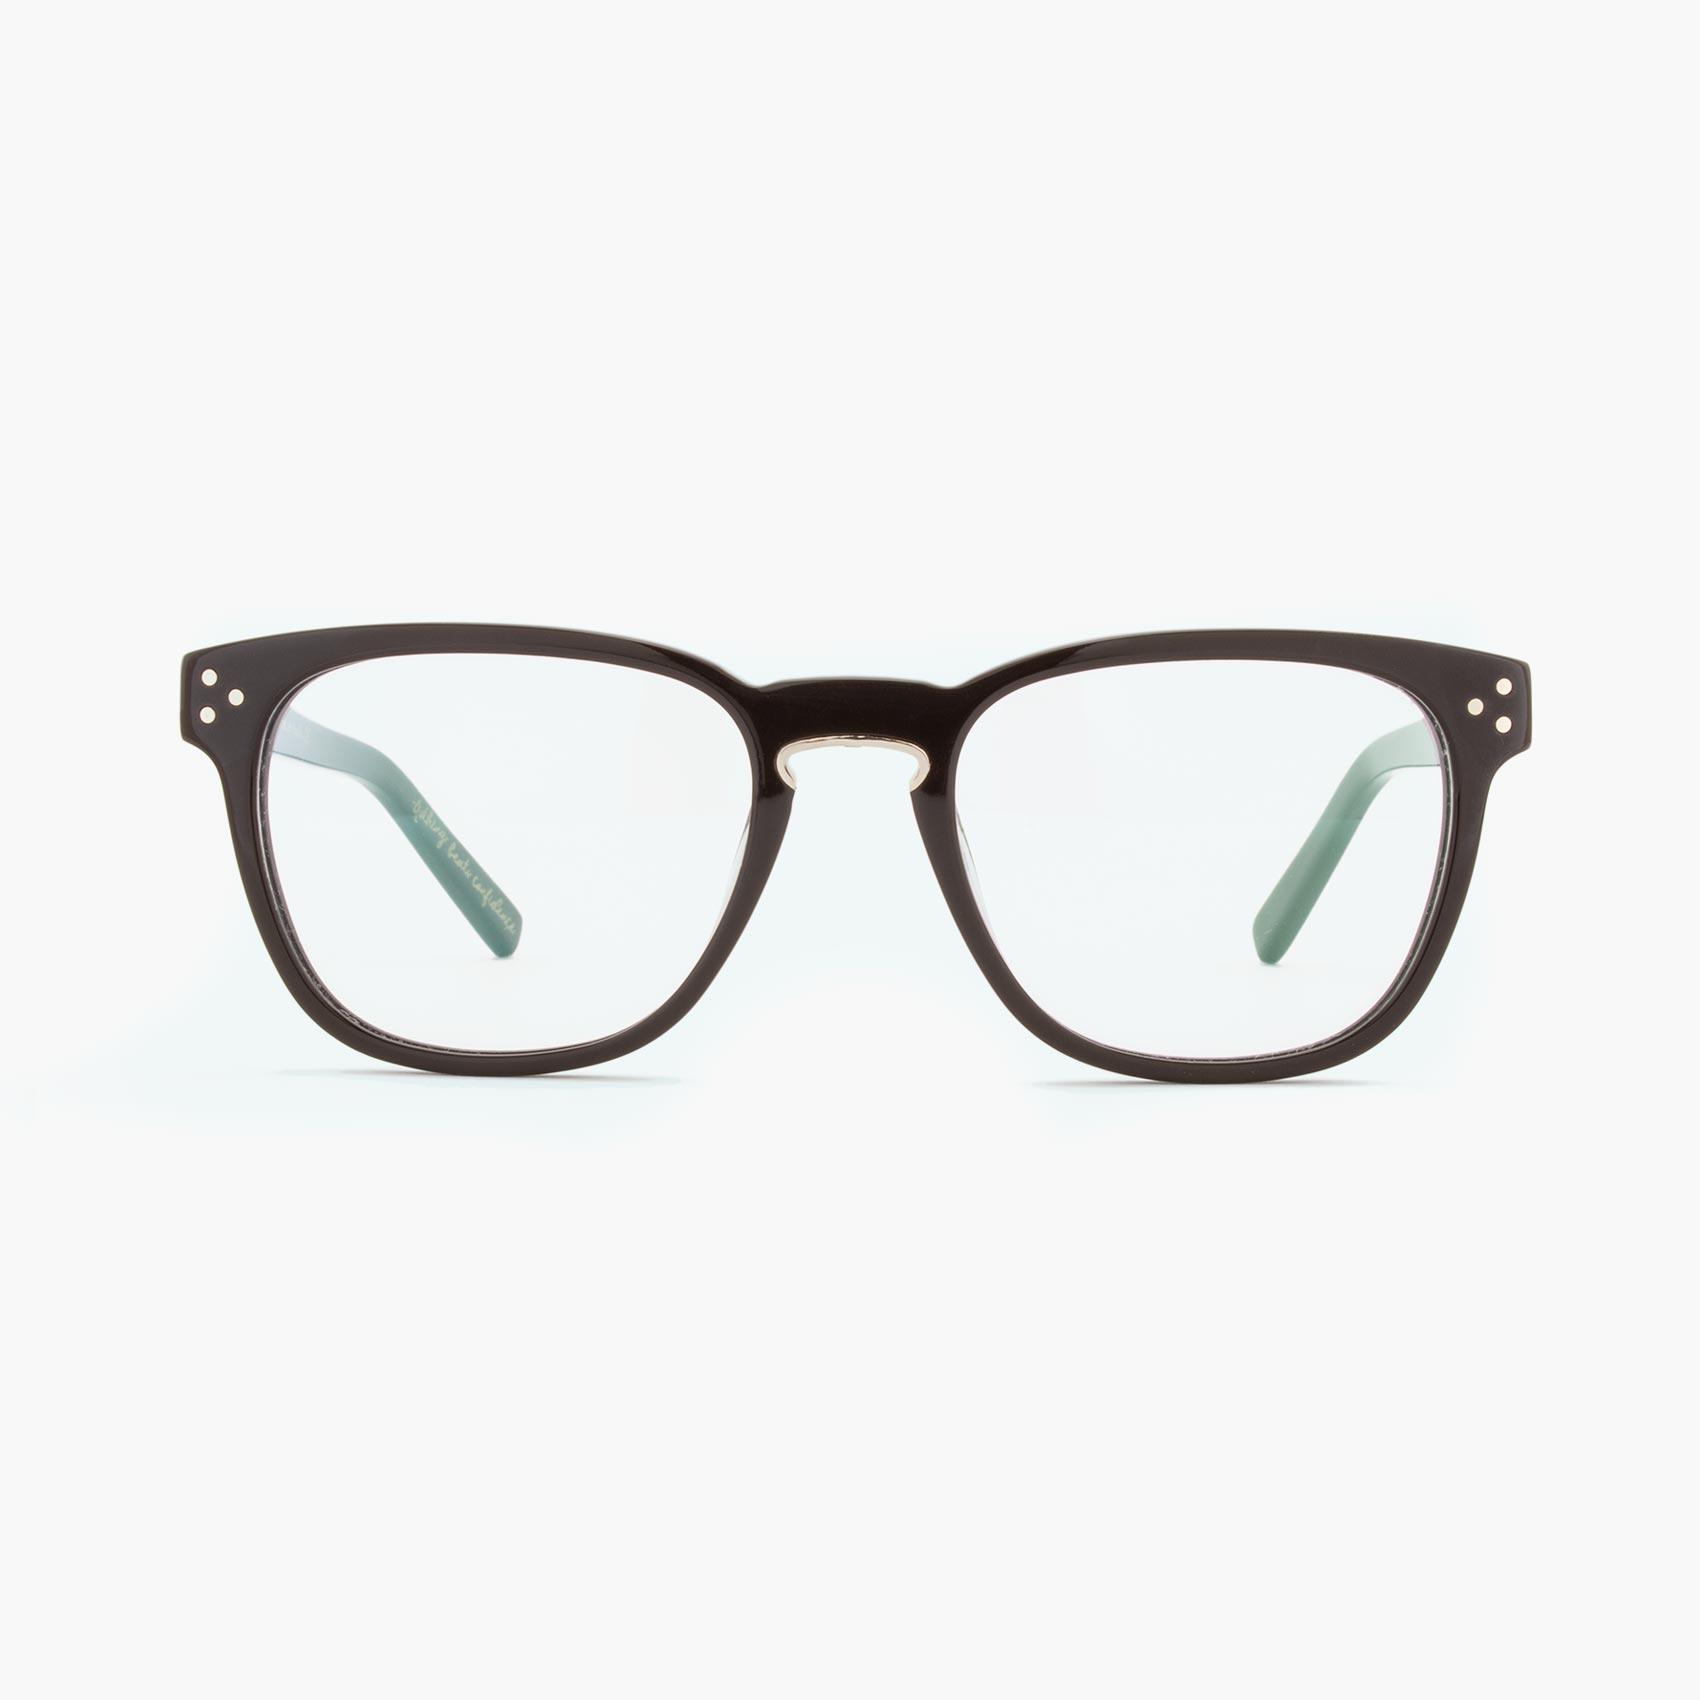 Proud eyewear Firth C2 F gafas puente cerradura marron oscuro